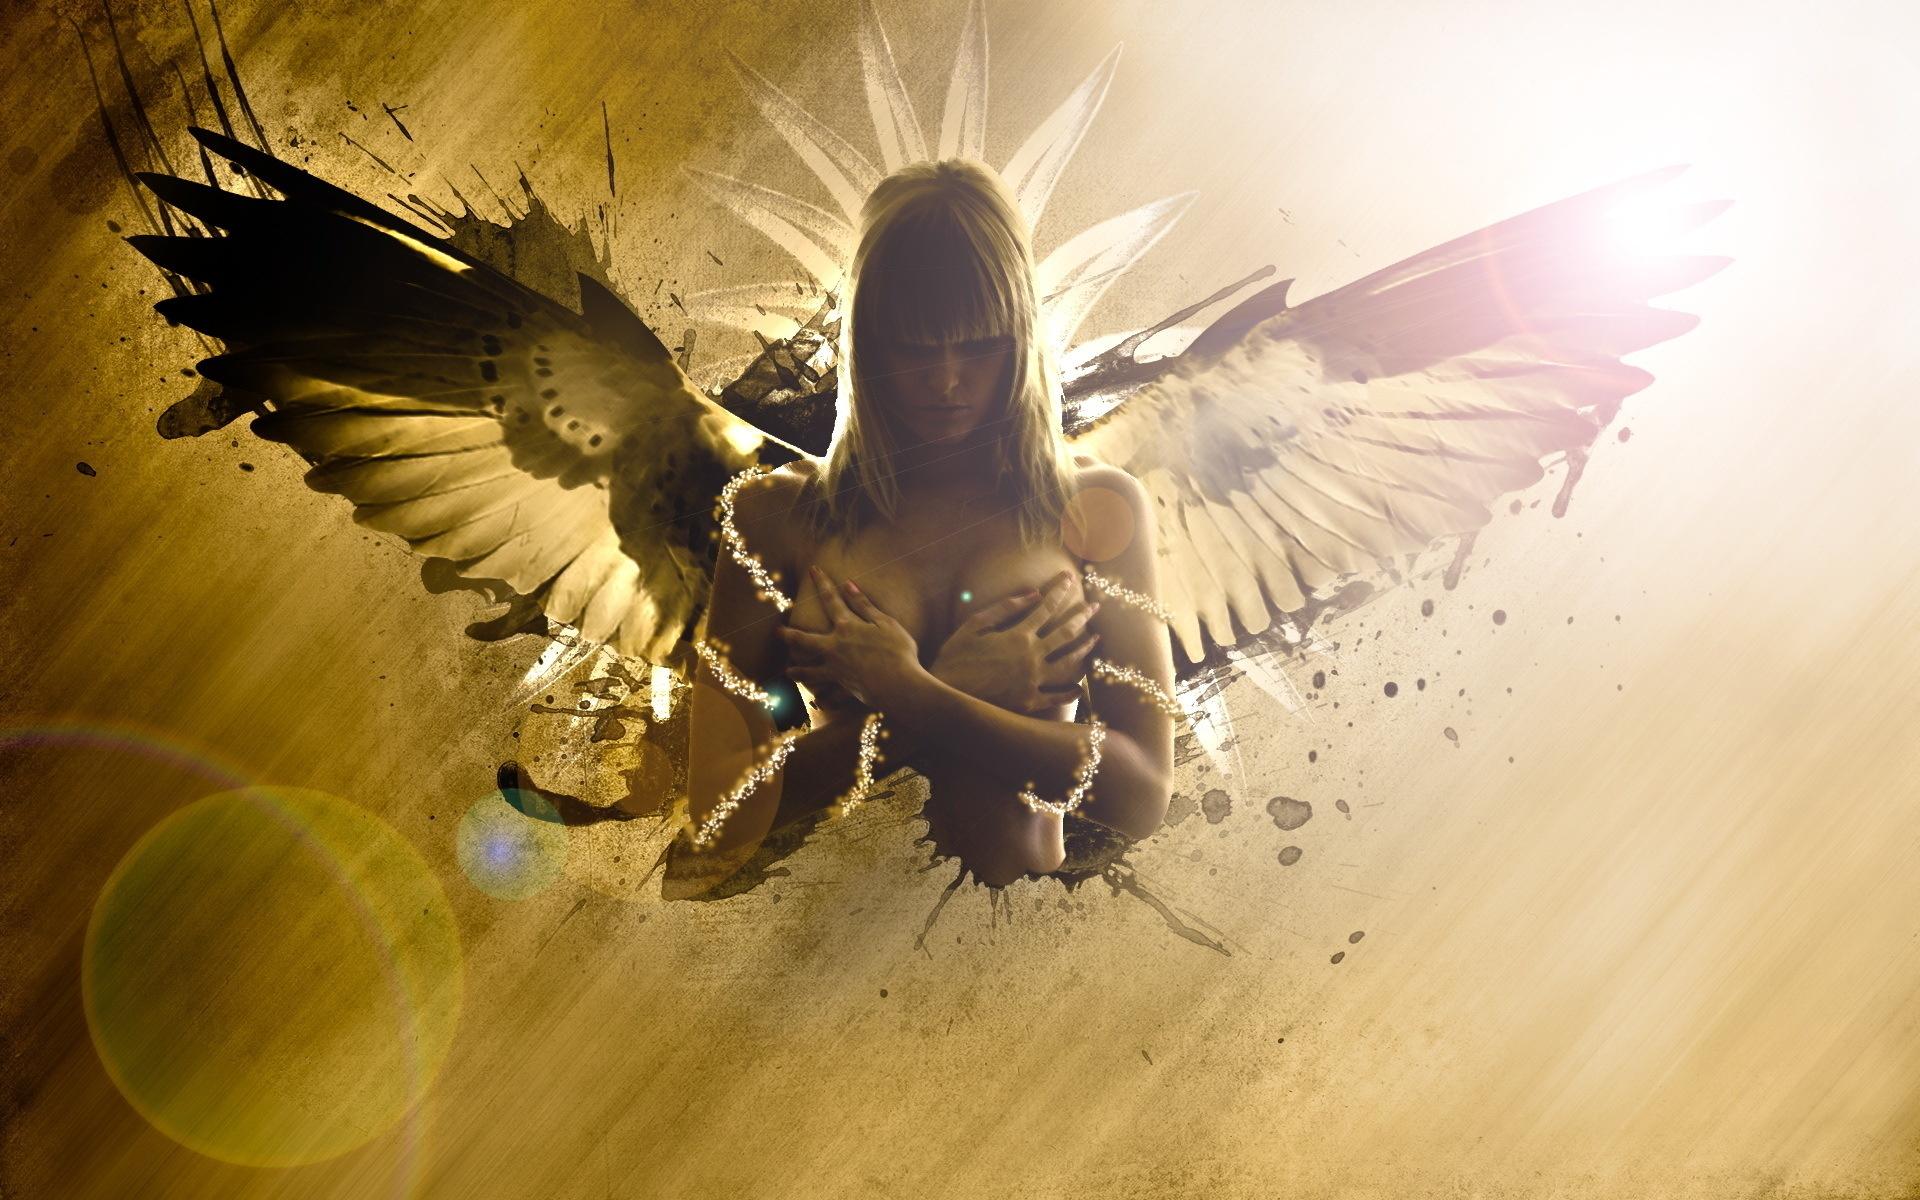 молодых креативные ангелы картинки сила это